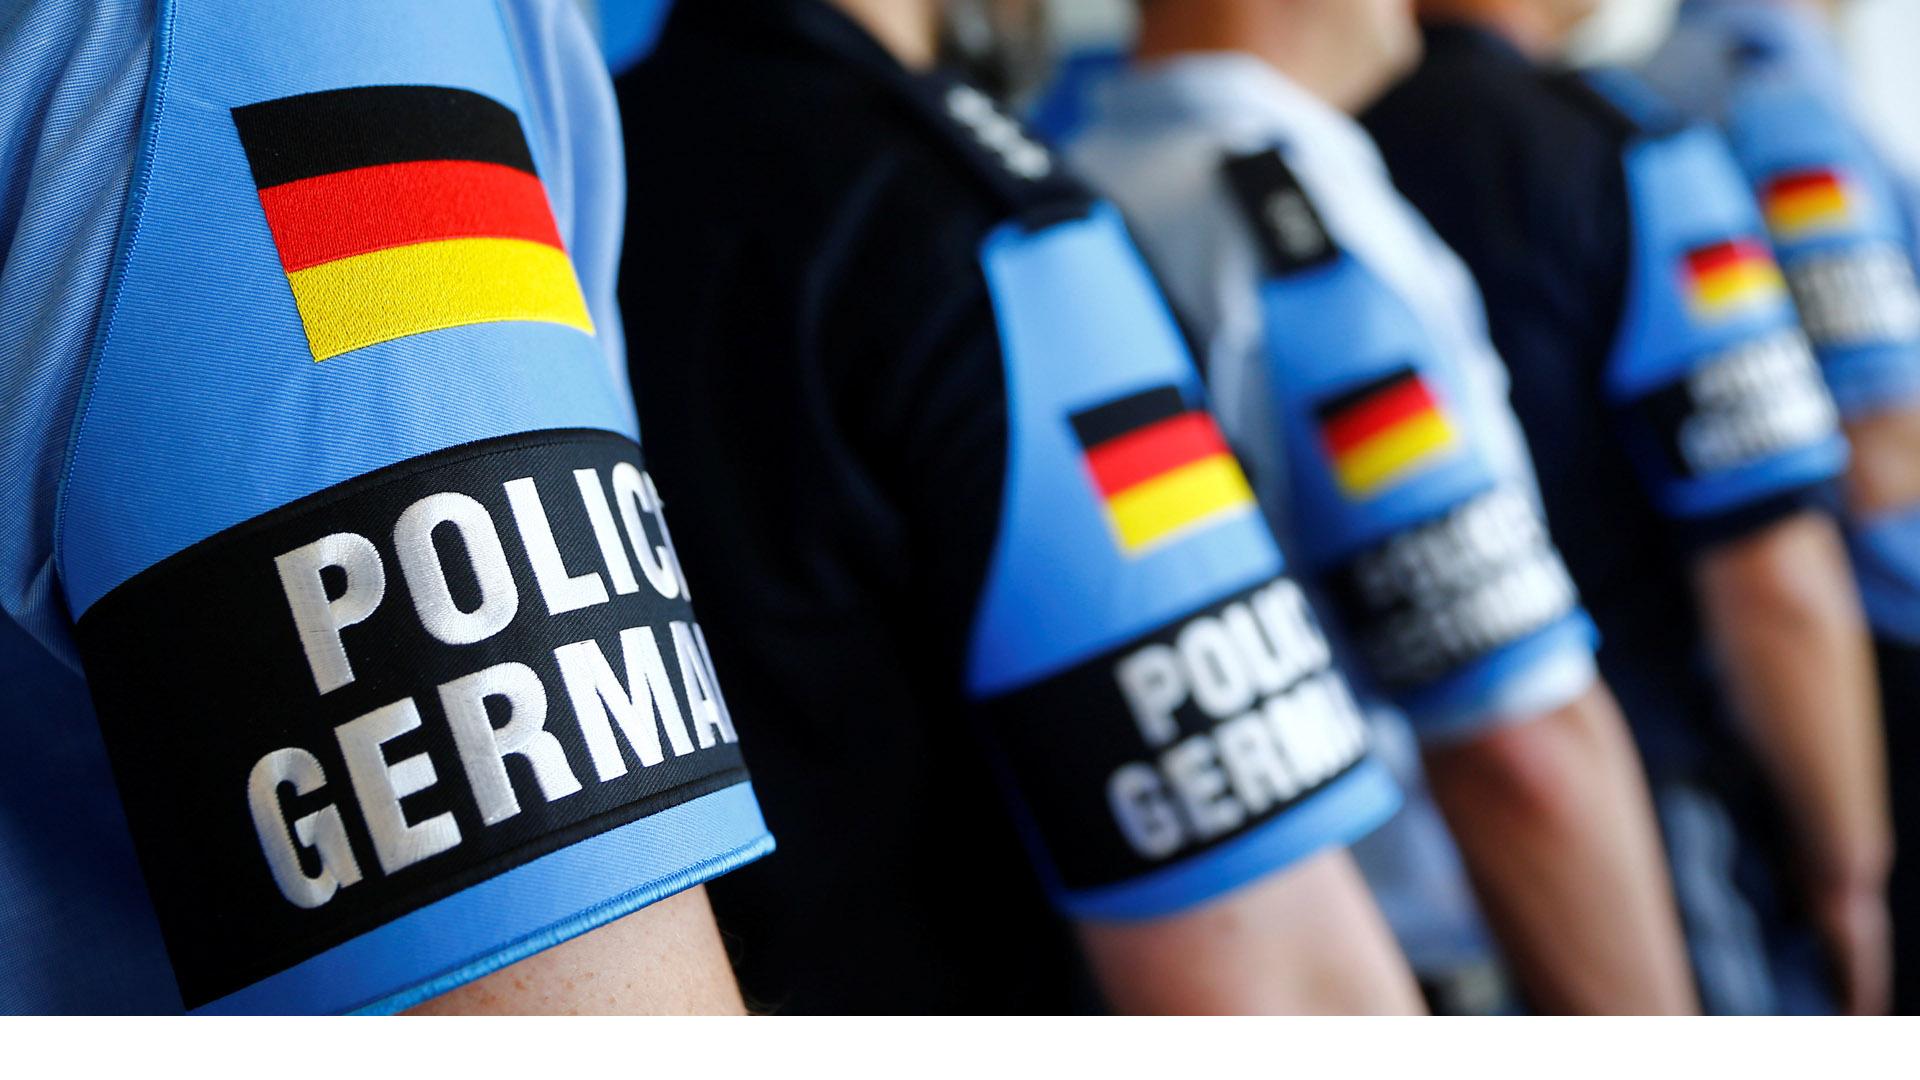 Policía alemana detuvo a seis rusos